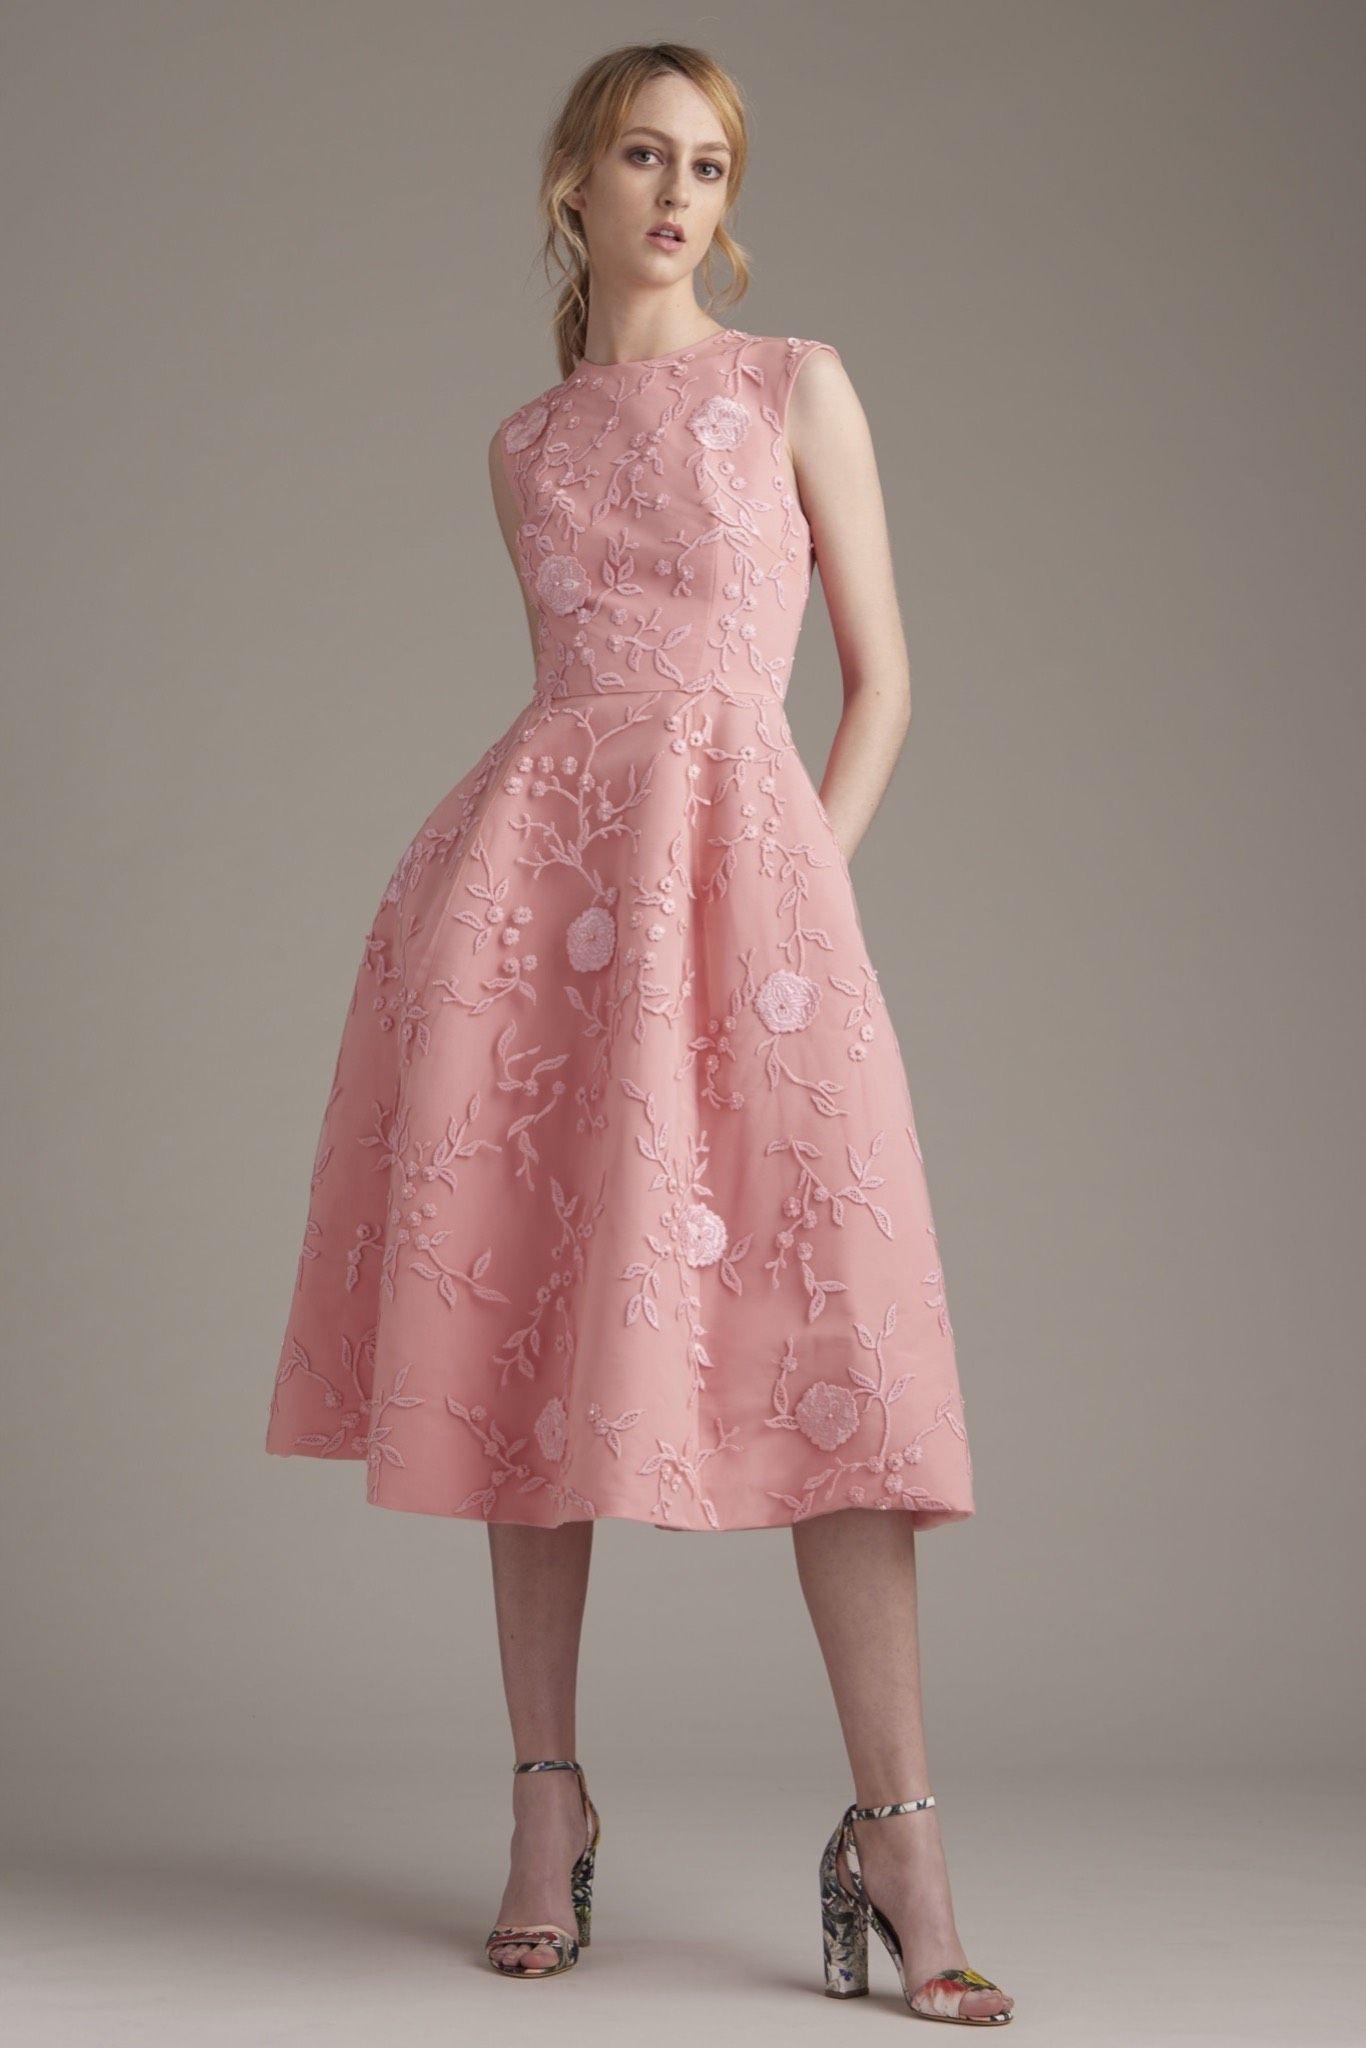 Monique Lhuillier Resort 2016 | Dresses | Pinterest | Moda 2016 ...